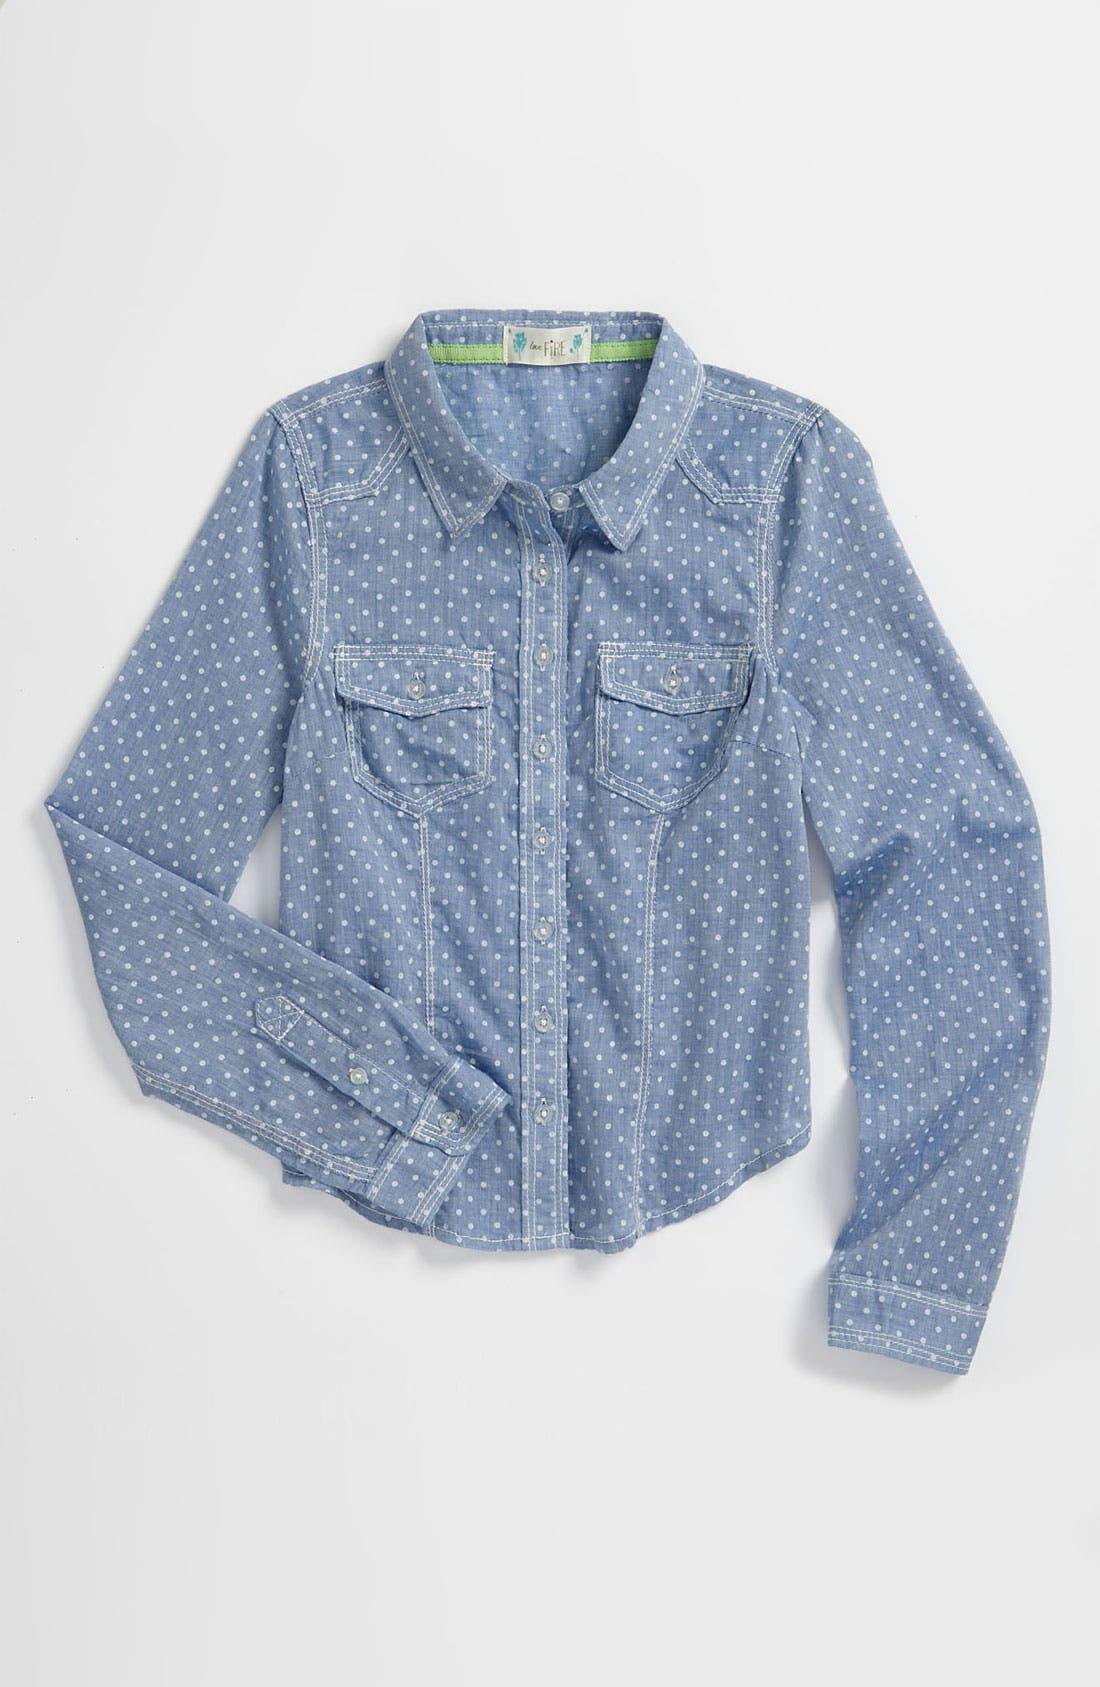 Alternate Image 1 Selected - Fire Polka Dot Chambray Shirt (Little Girls & Big Girls)